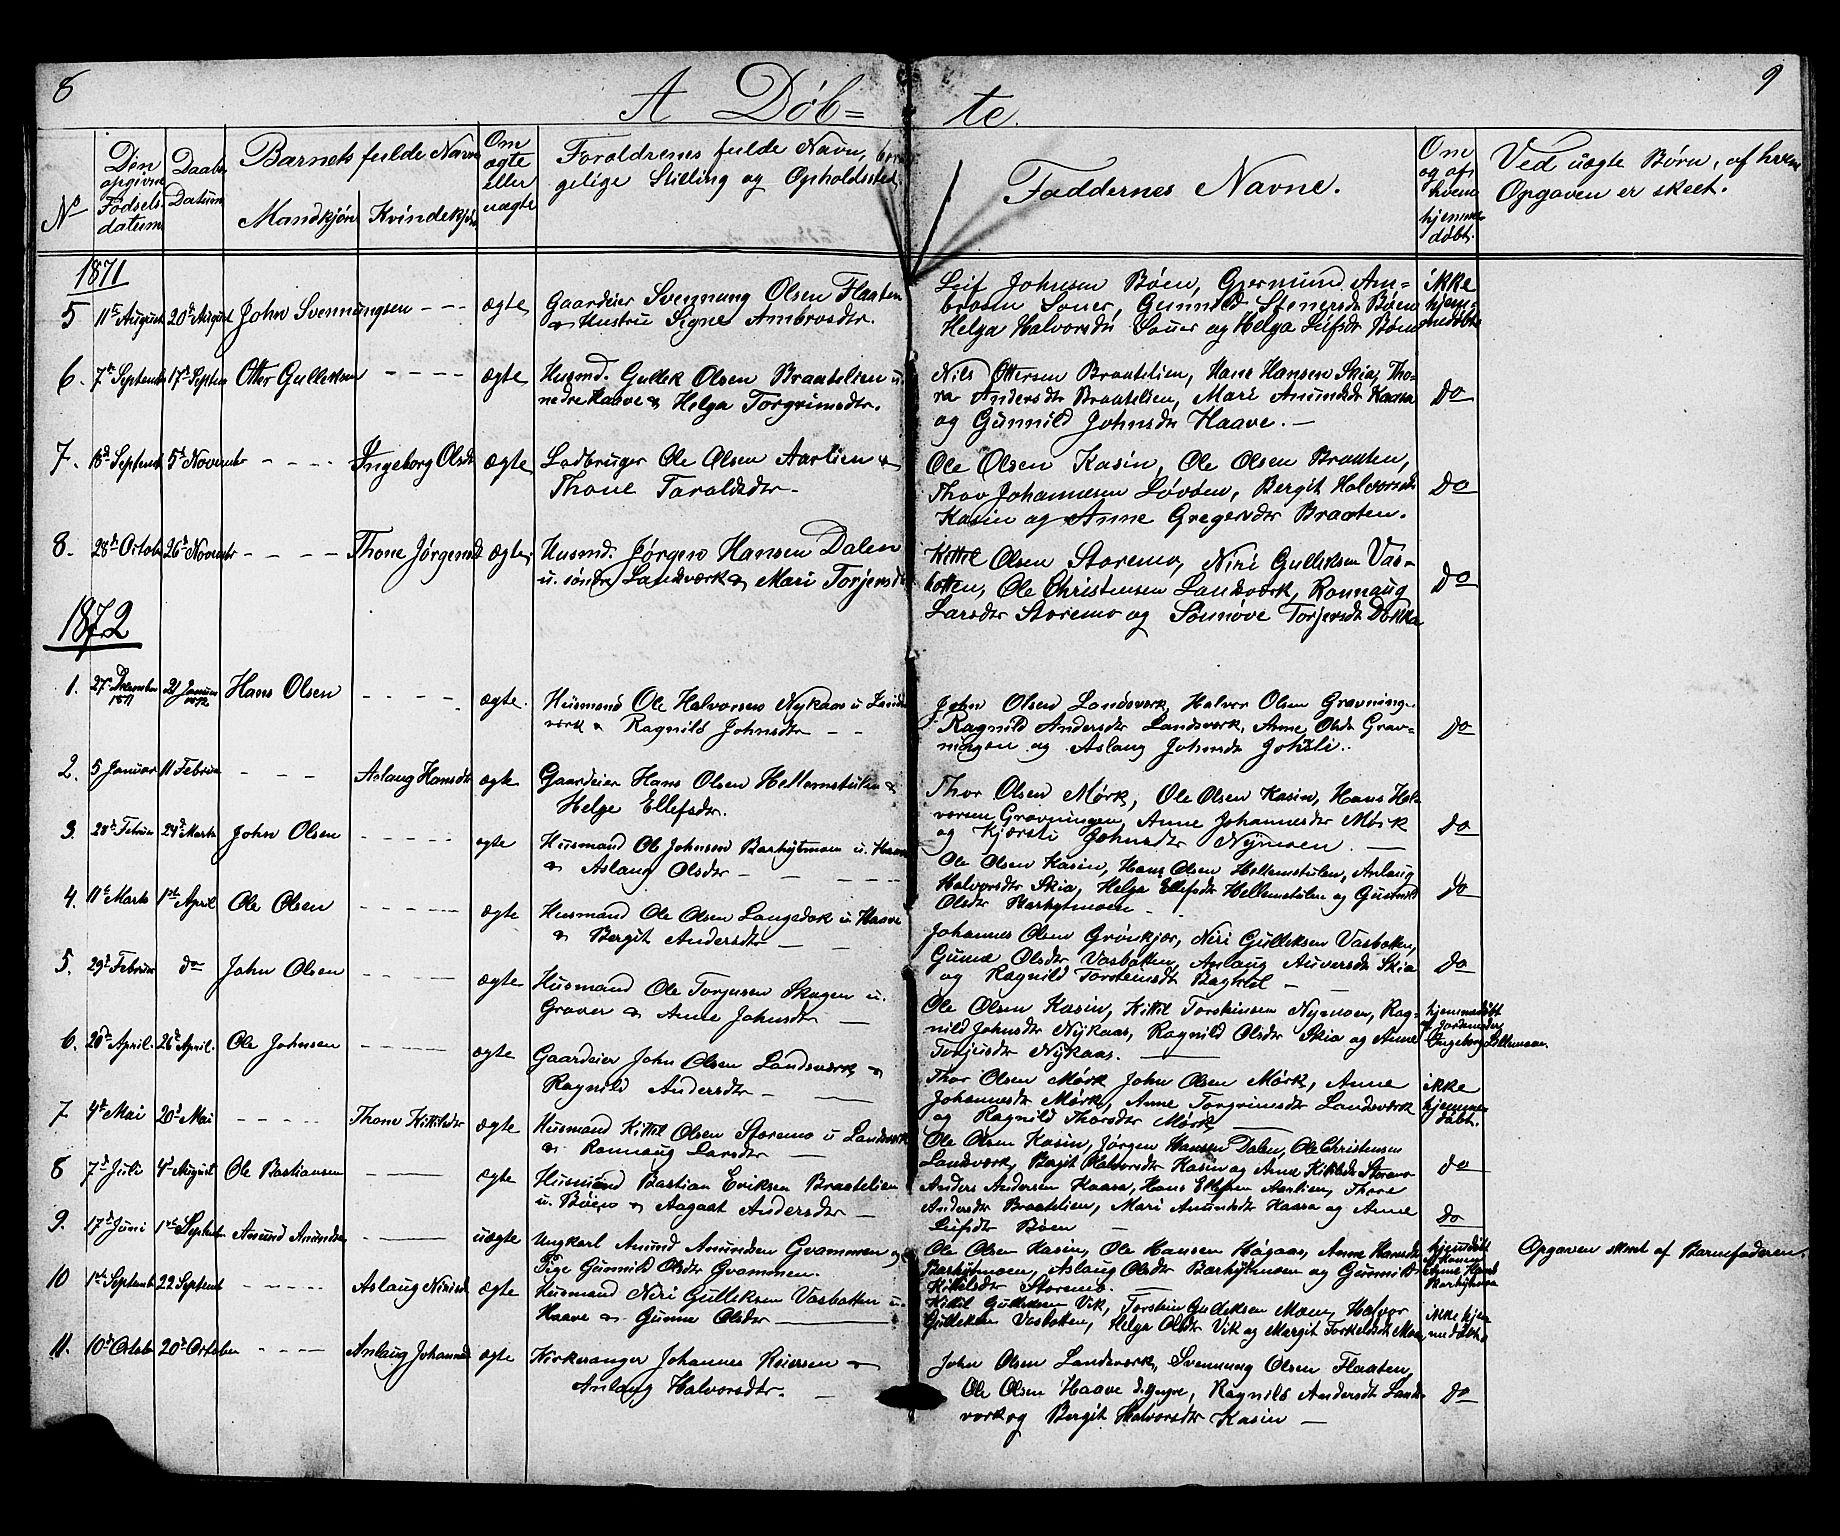 SAKO, Heddal kirkebøker, G/Gb/L0001: Klokkerbok nr. II 1, 1866-1887, s. 8-9